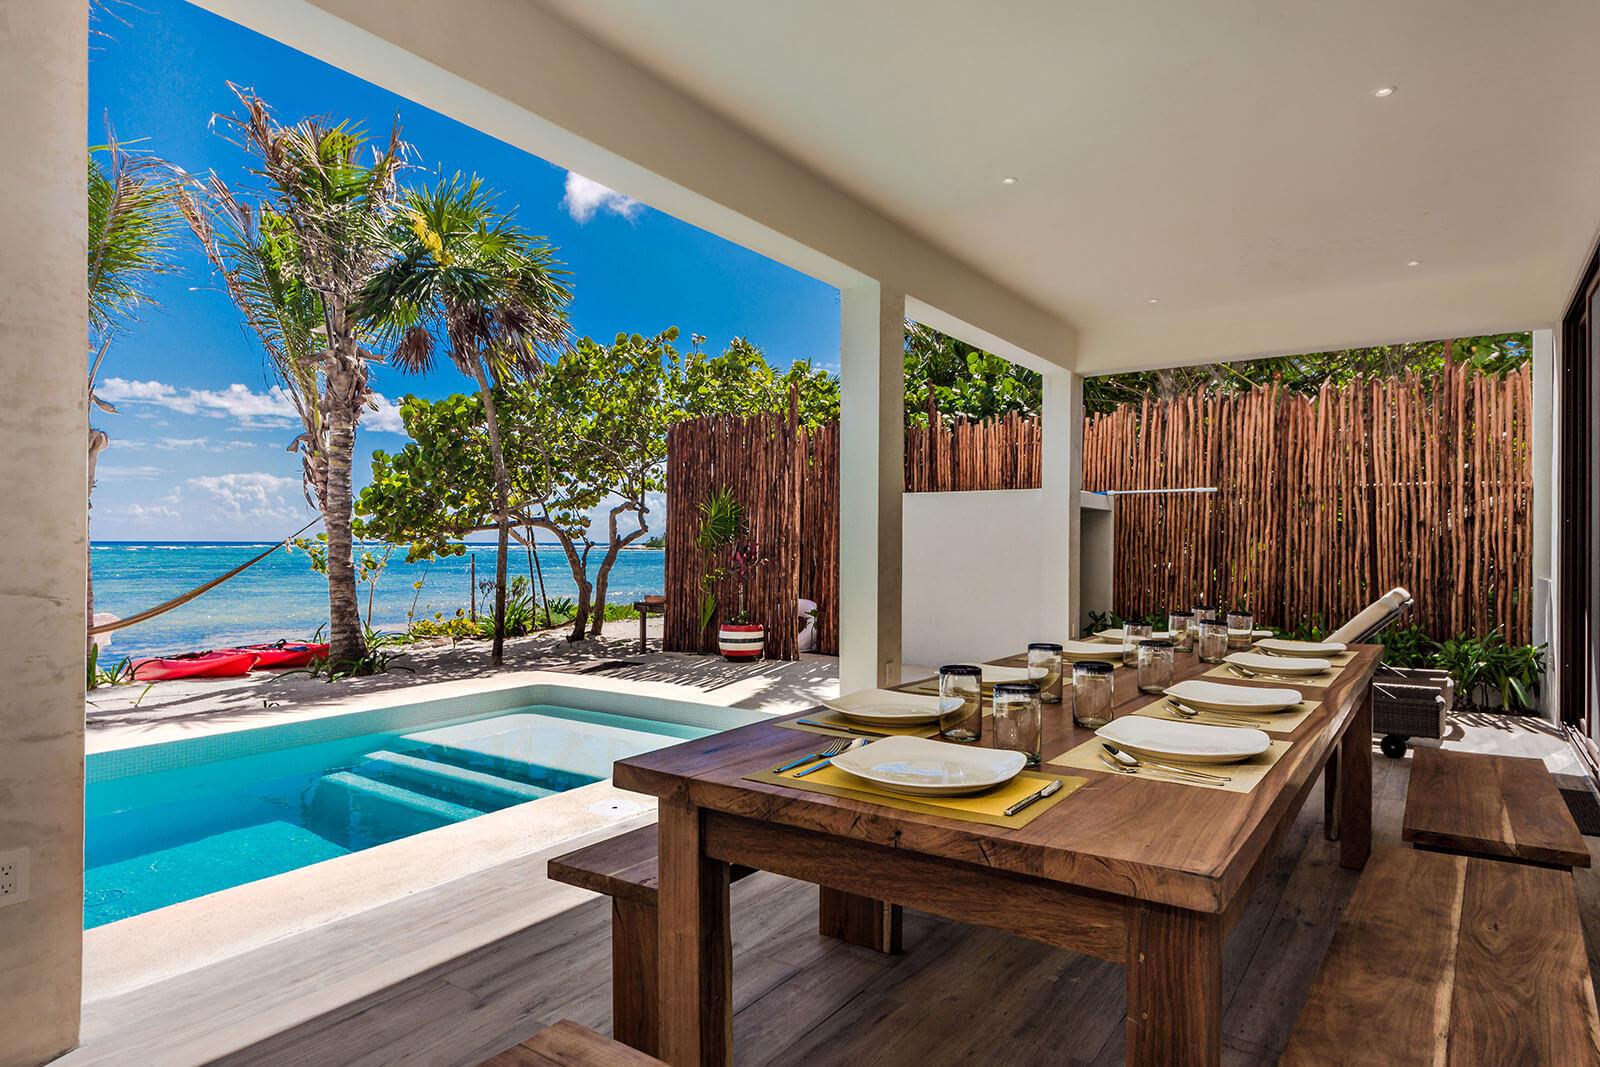 Maya_Luxe_Riviera_Maya_Luxury_Villas_Experiences_Tulum_Soliman_Bay_5_Bedrooms_8.jpg